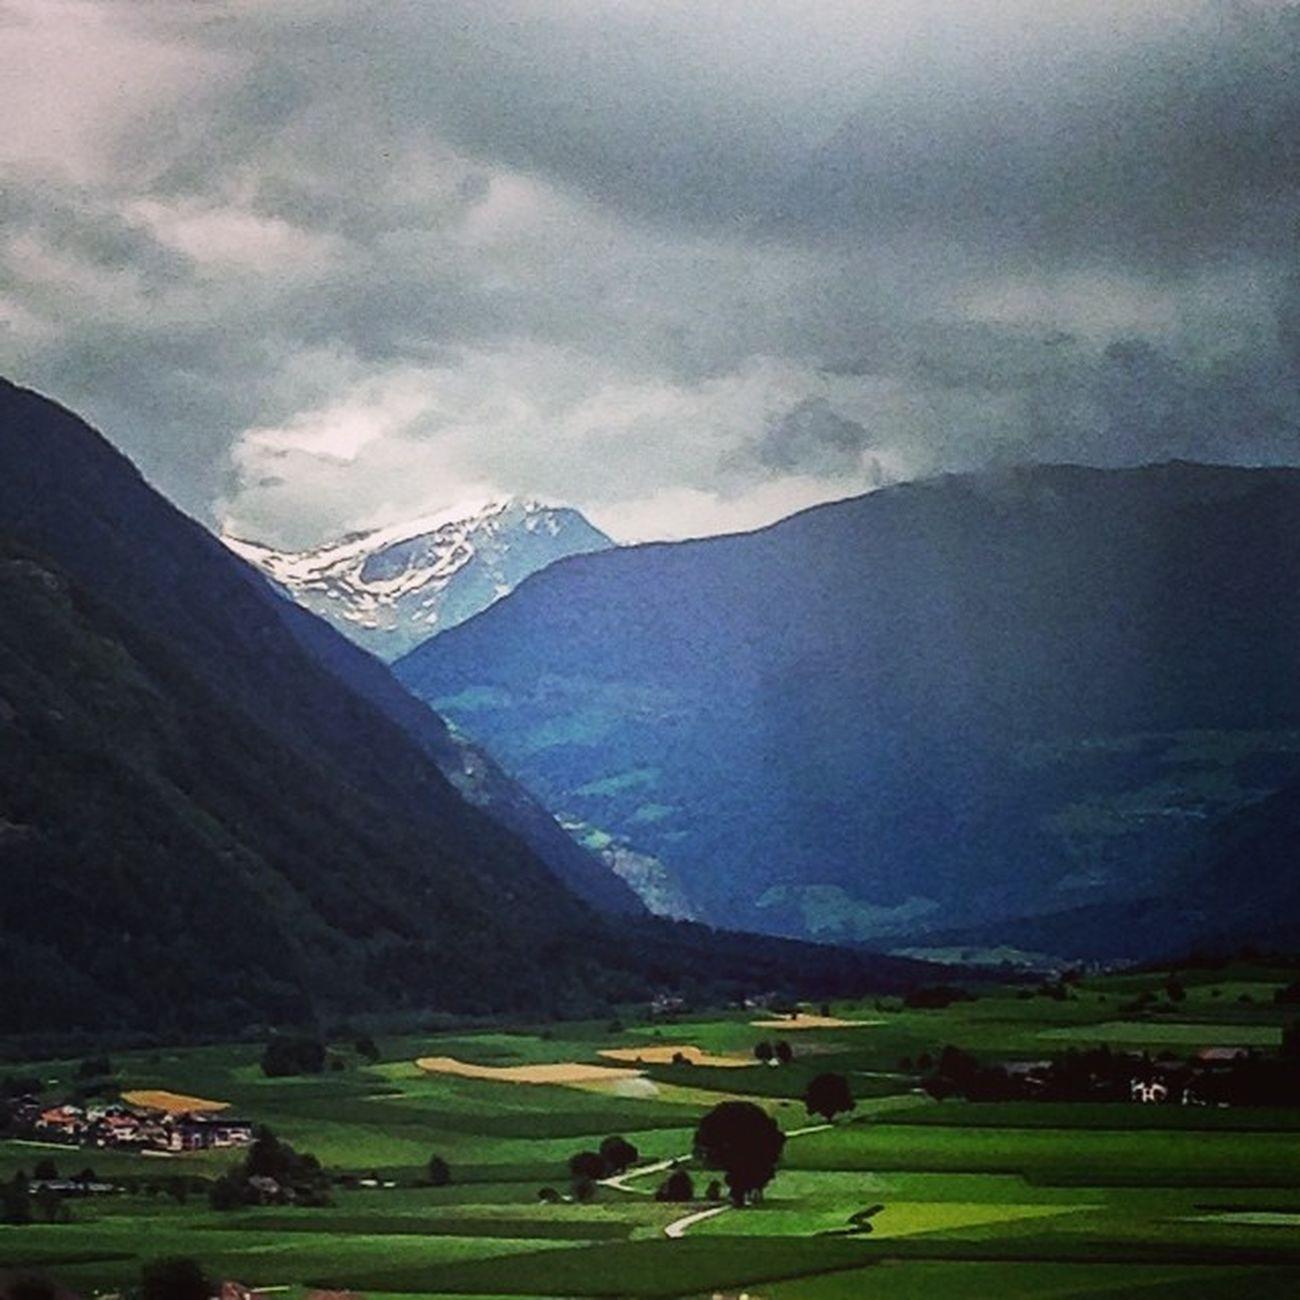 Clouds Summer Italy Rainy Mmm Ripa Alps Lifeisbeautiful Dolomites LifeLessOrdinary Messner Bruenik